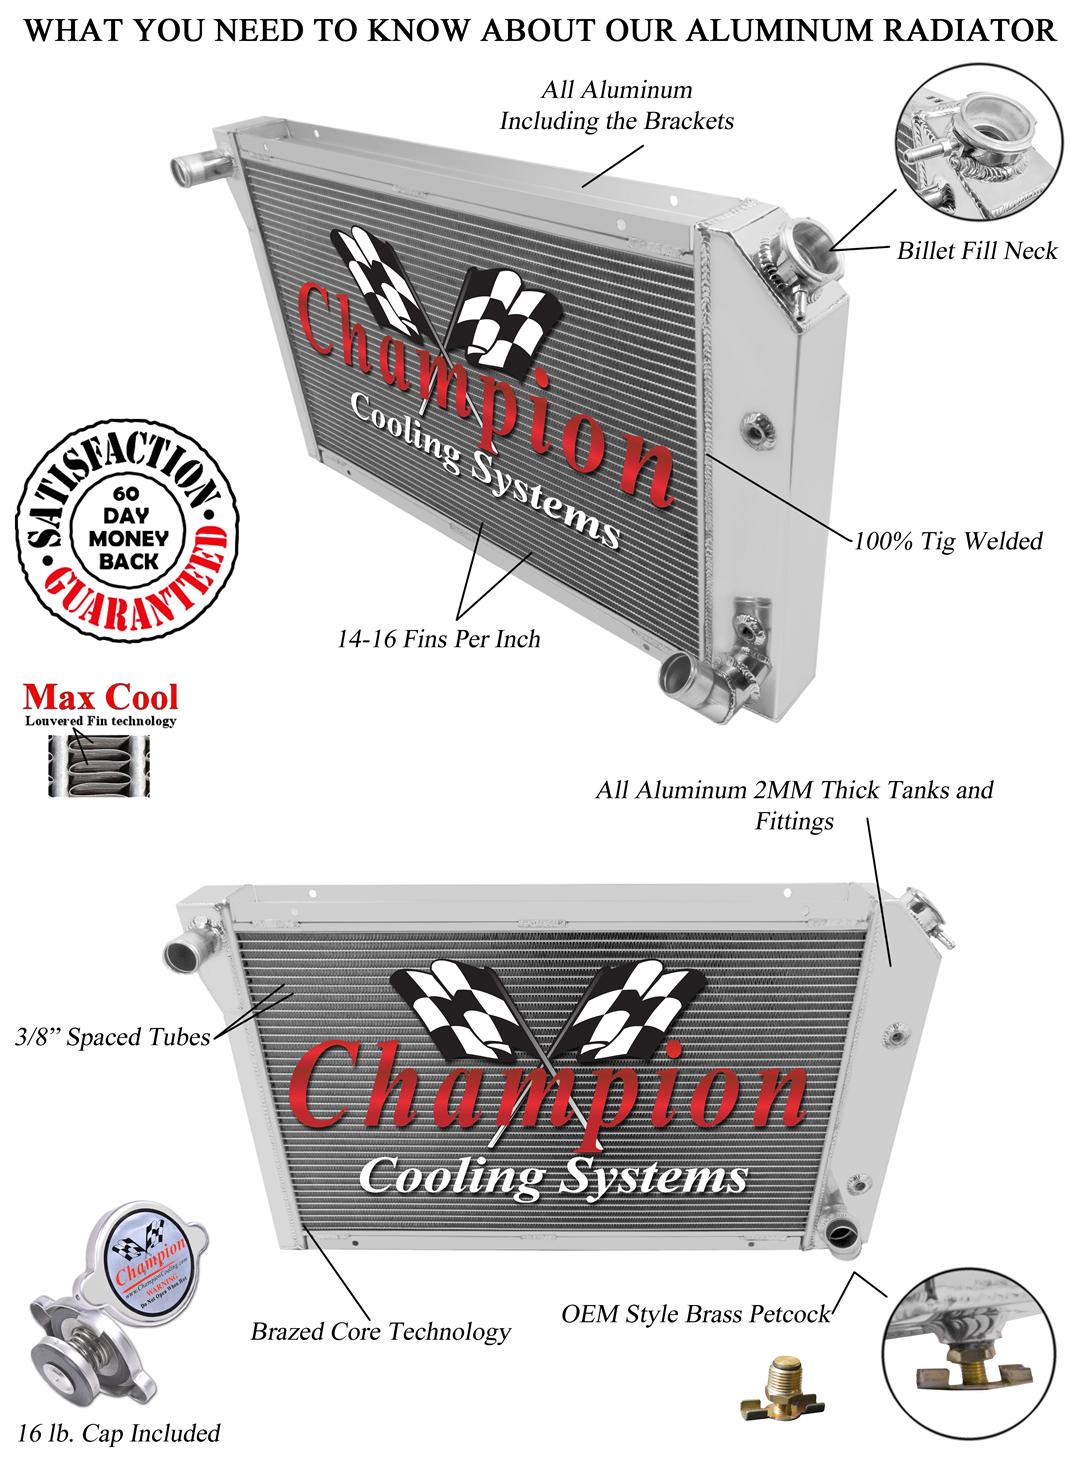 1977 1978 1979 1980 1981 Chevy Corvette 3 Core Champion All Aluminum DR Radiator